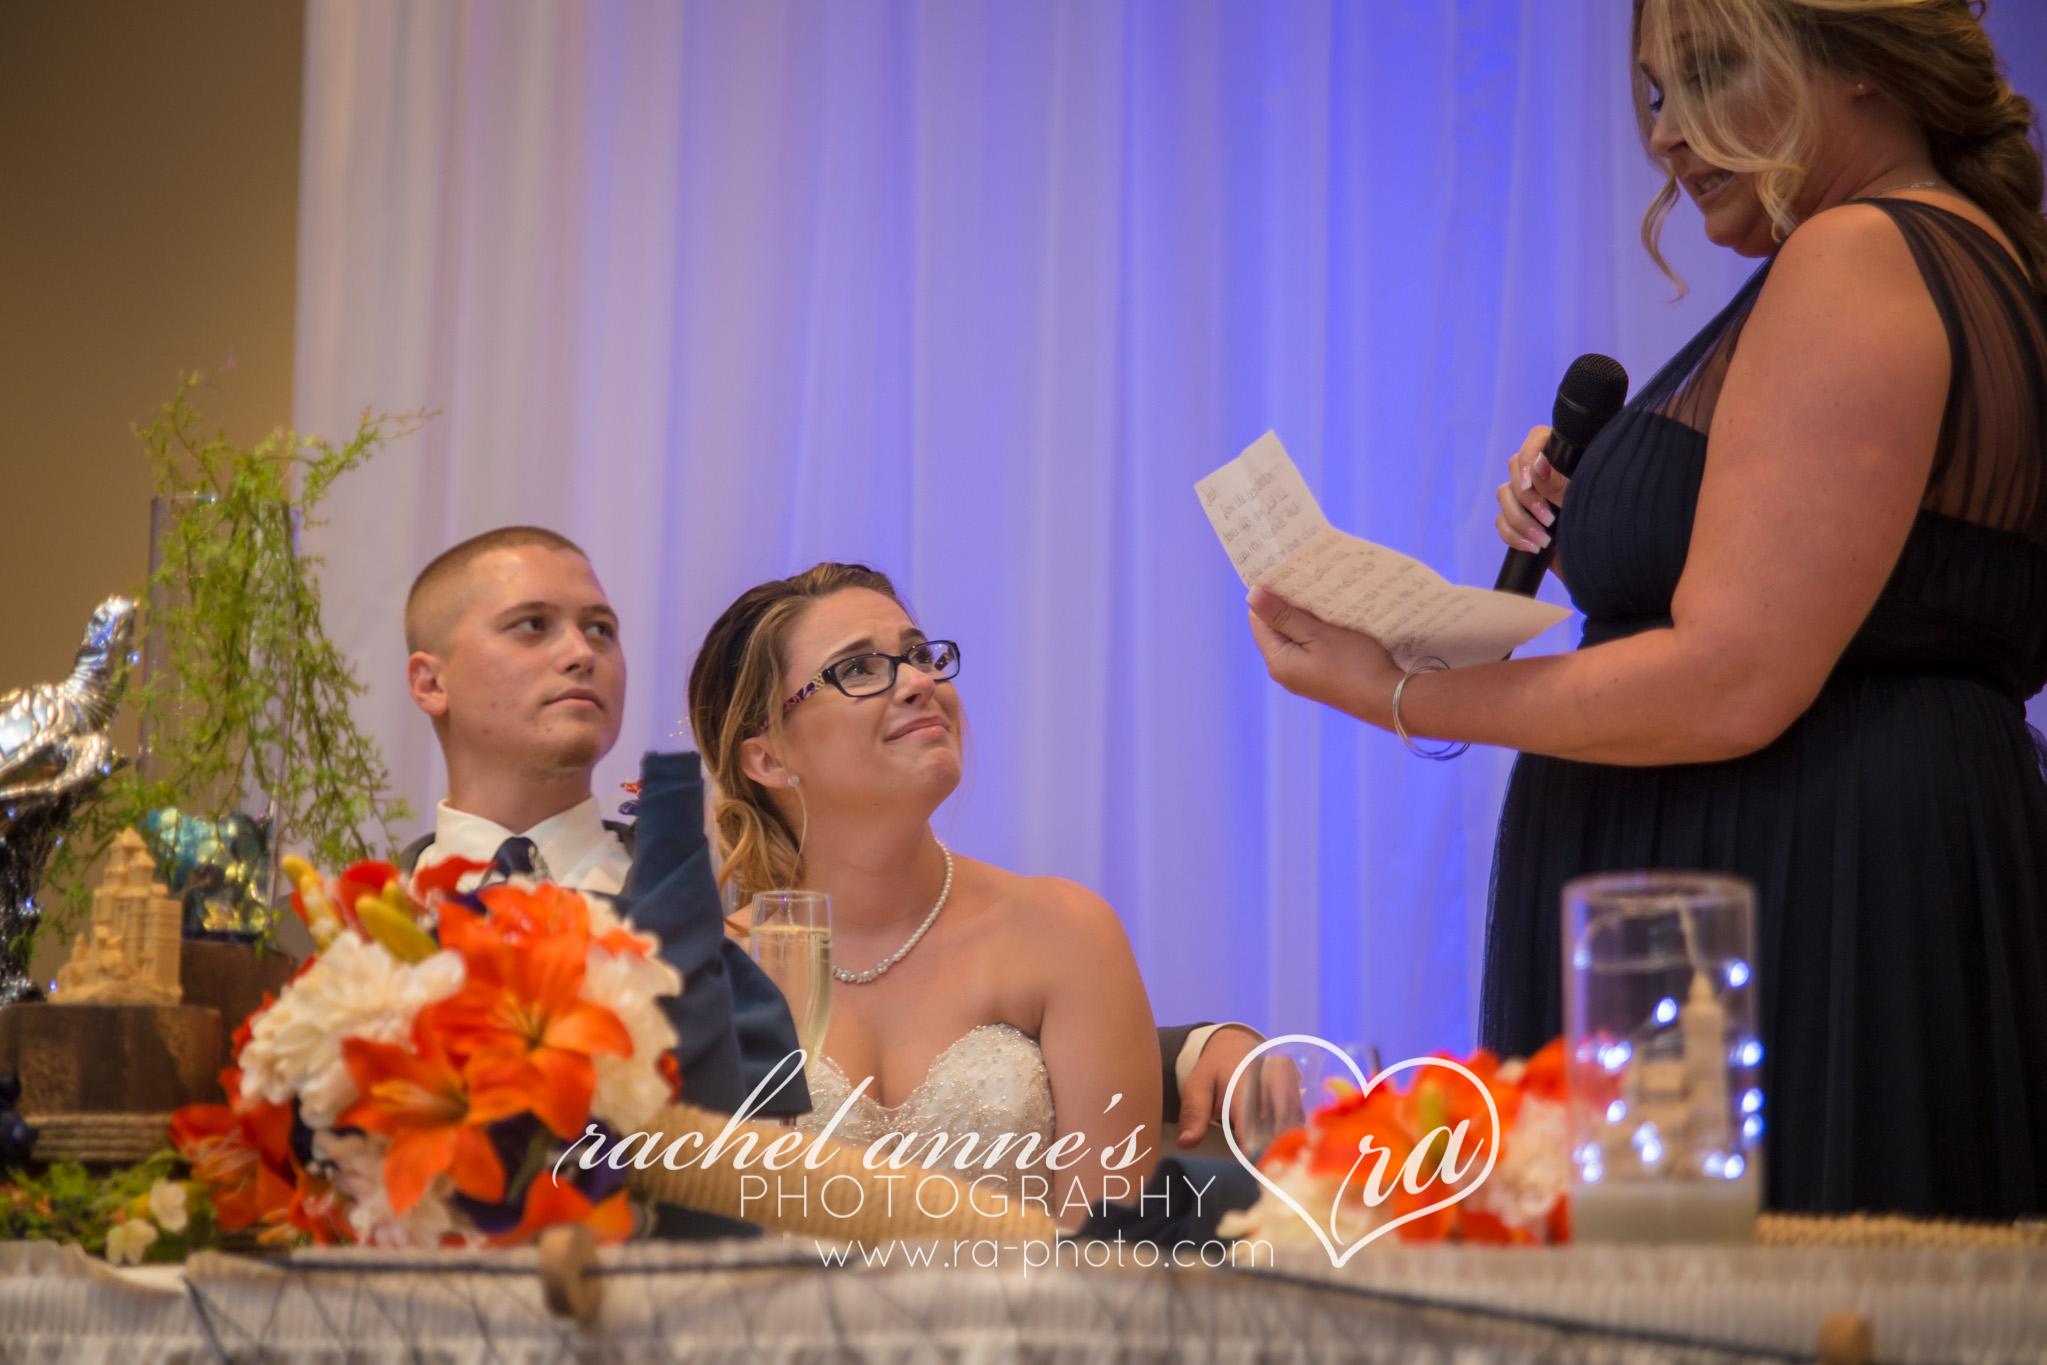 061-JCM-OLD-ECONOMY-VILLAGE-THE-FEZ-PA-WEDDINGS.jpg